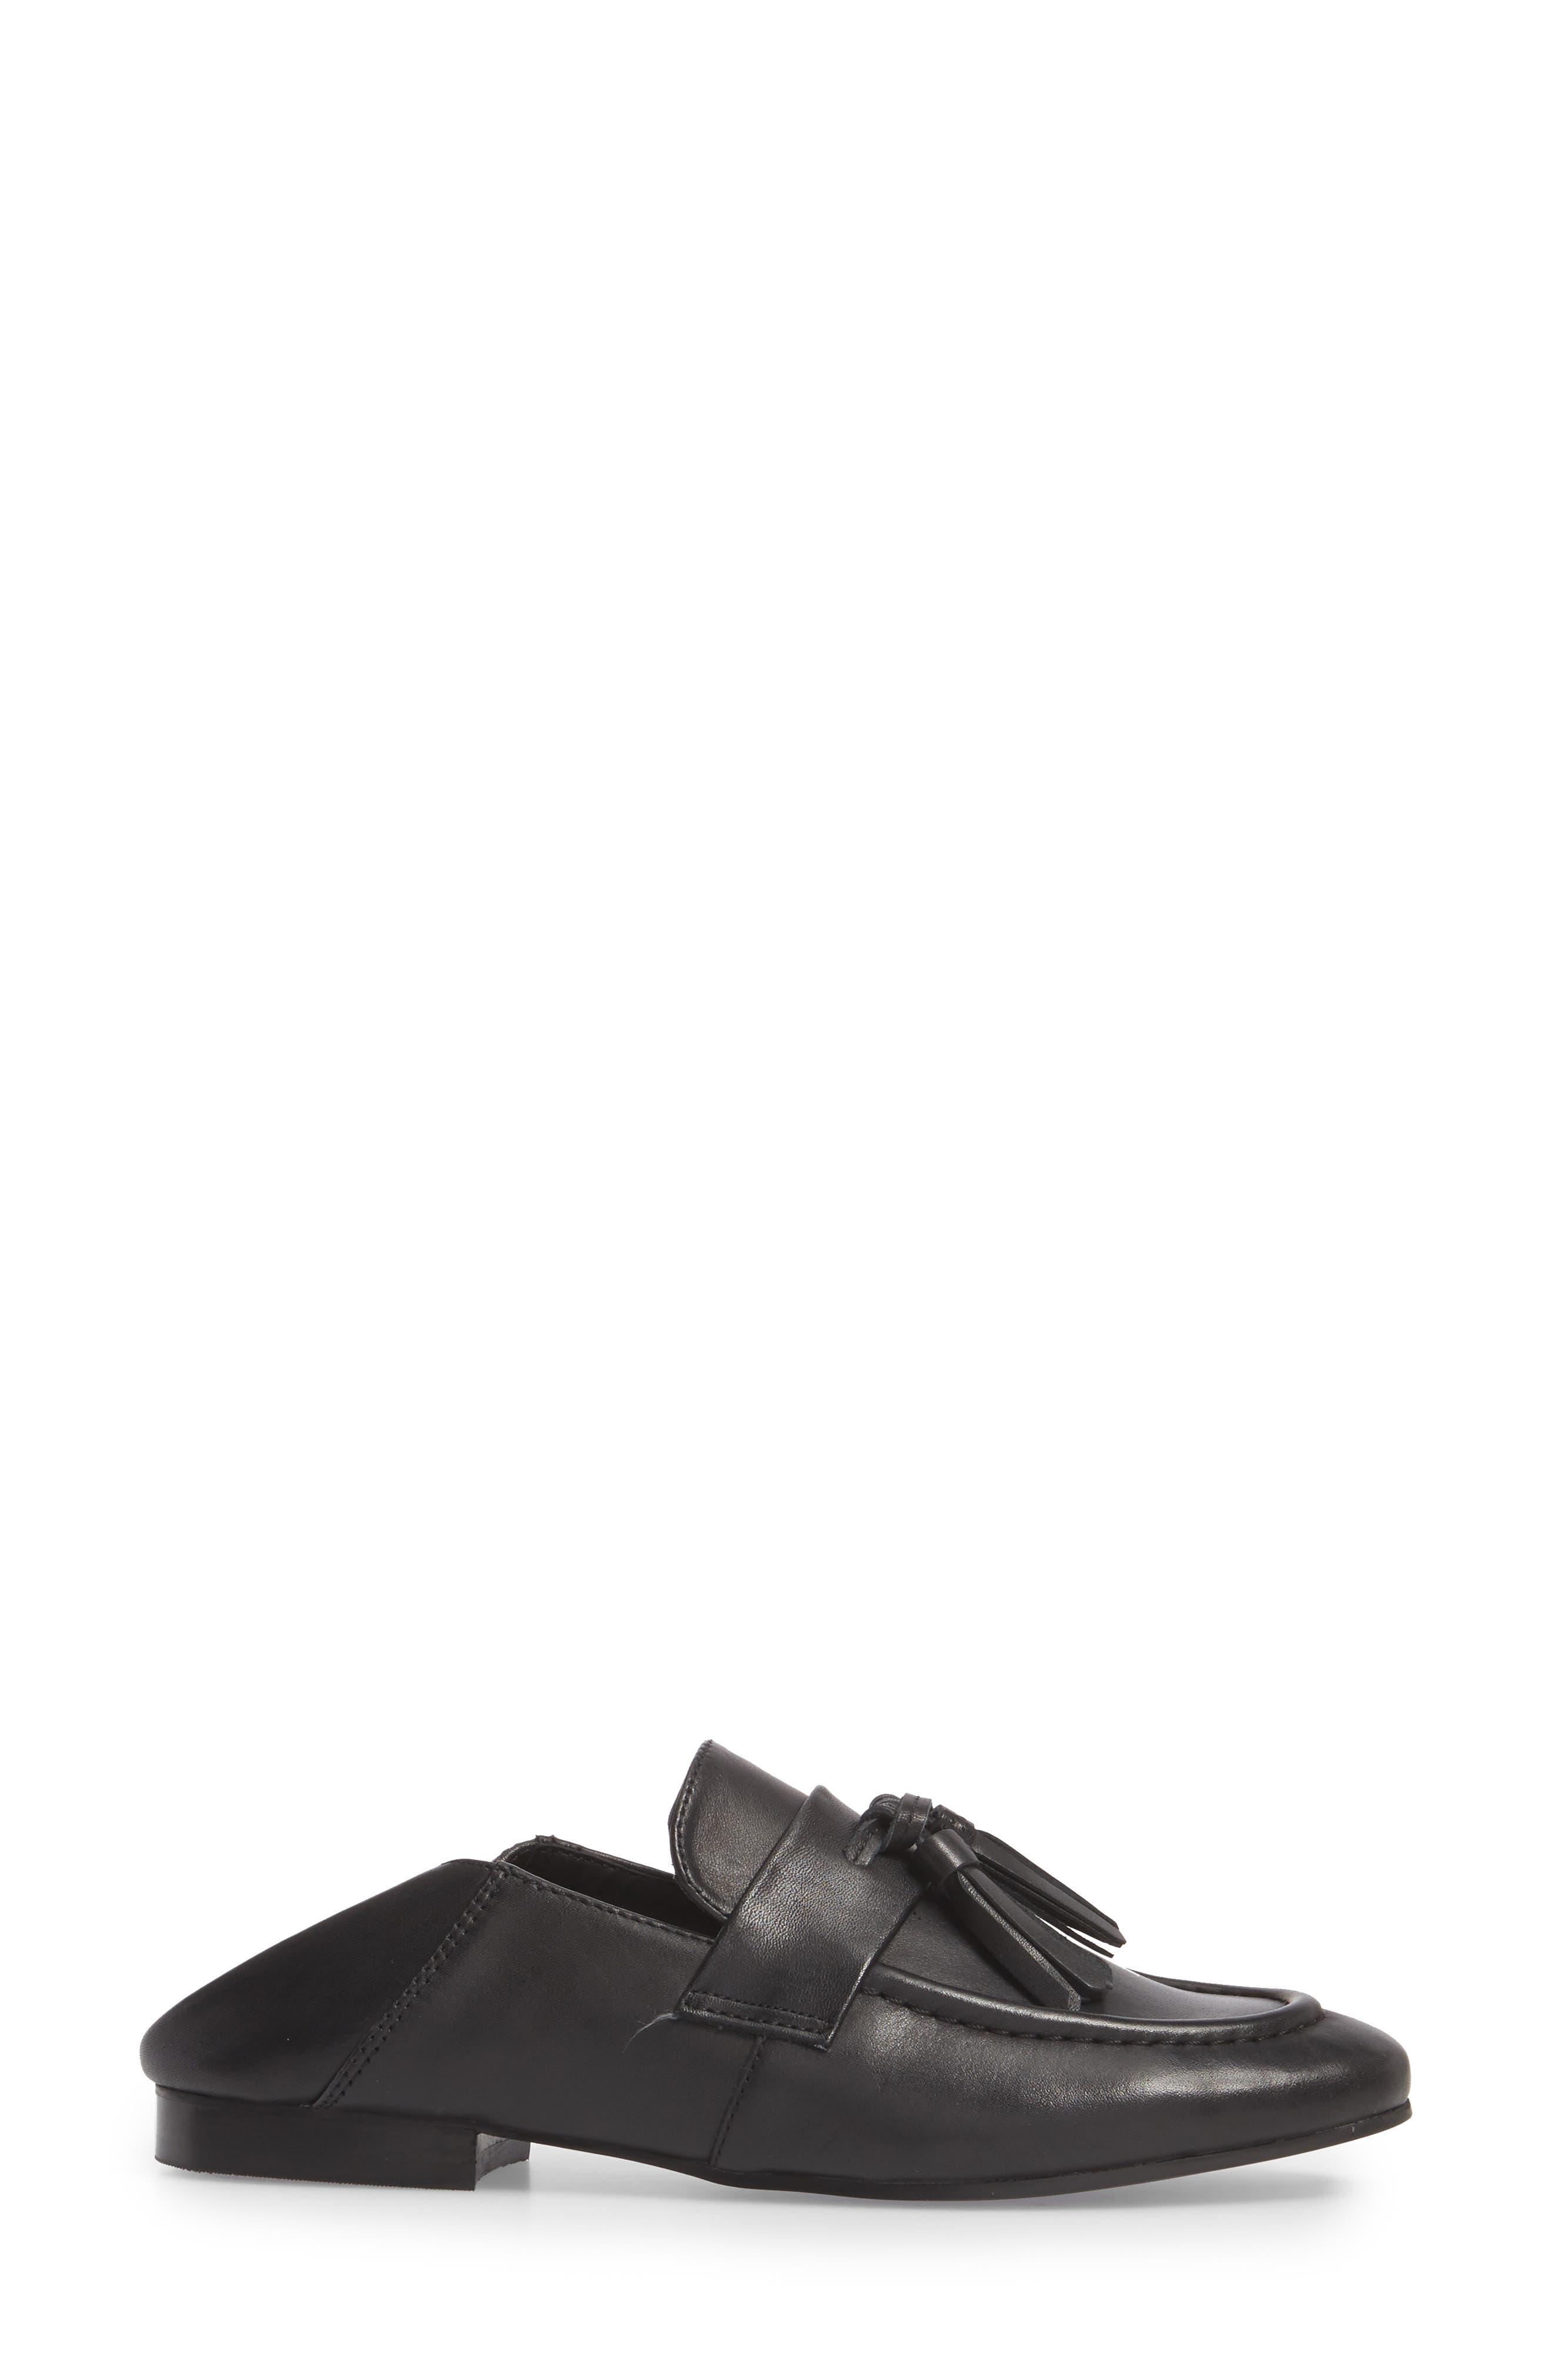 Beck Convertible Tasseled Loafer,                             Alternate thumbnail 7, color,                             001